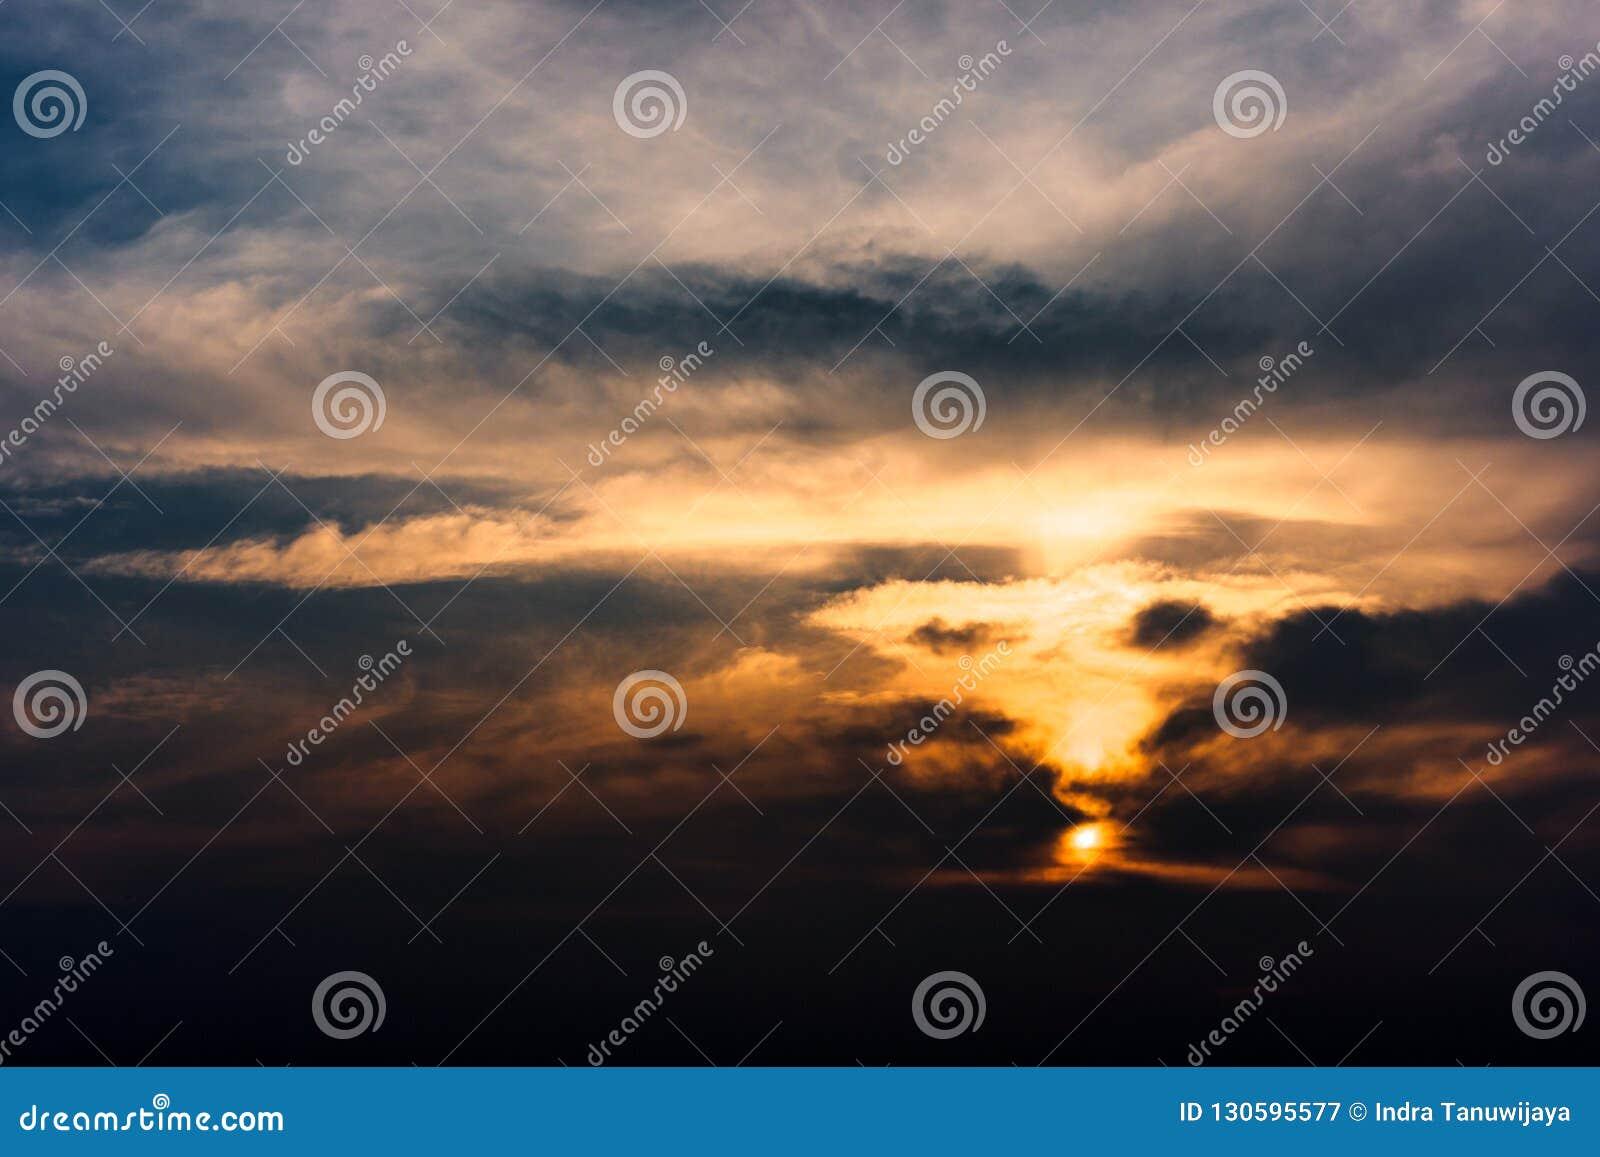 Dramatic cloud shapes like vortex